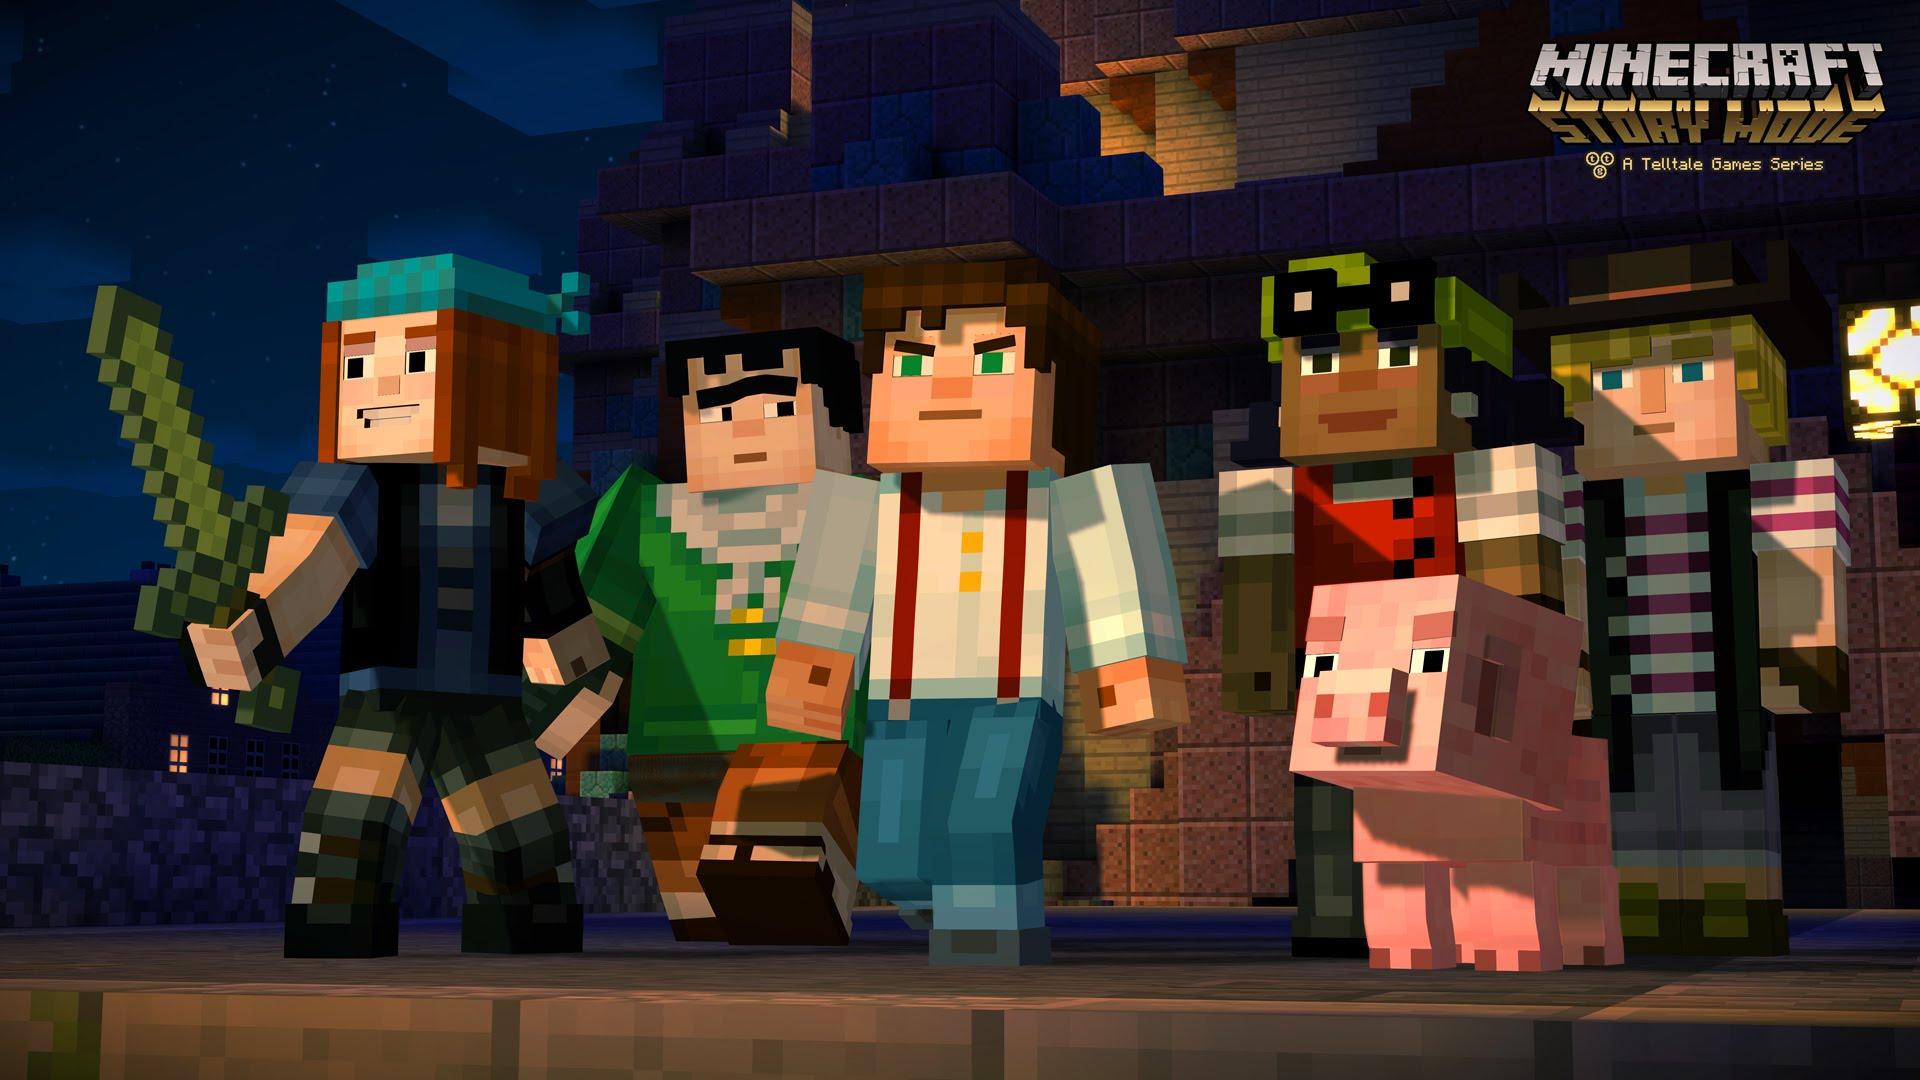 Minecraft-Story-Mode-